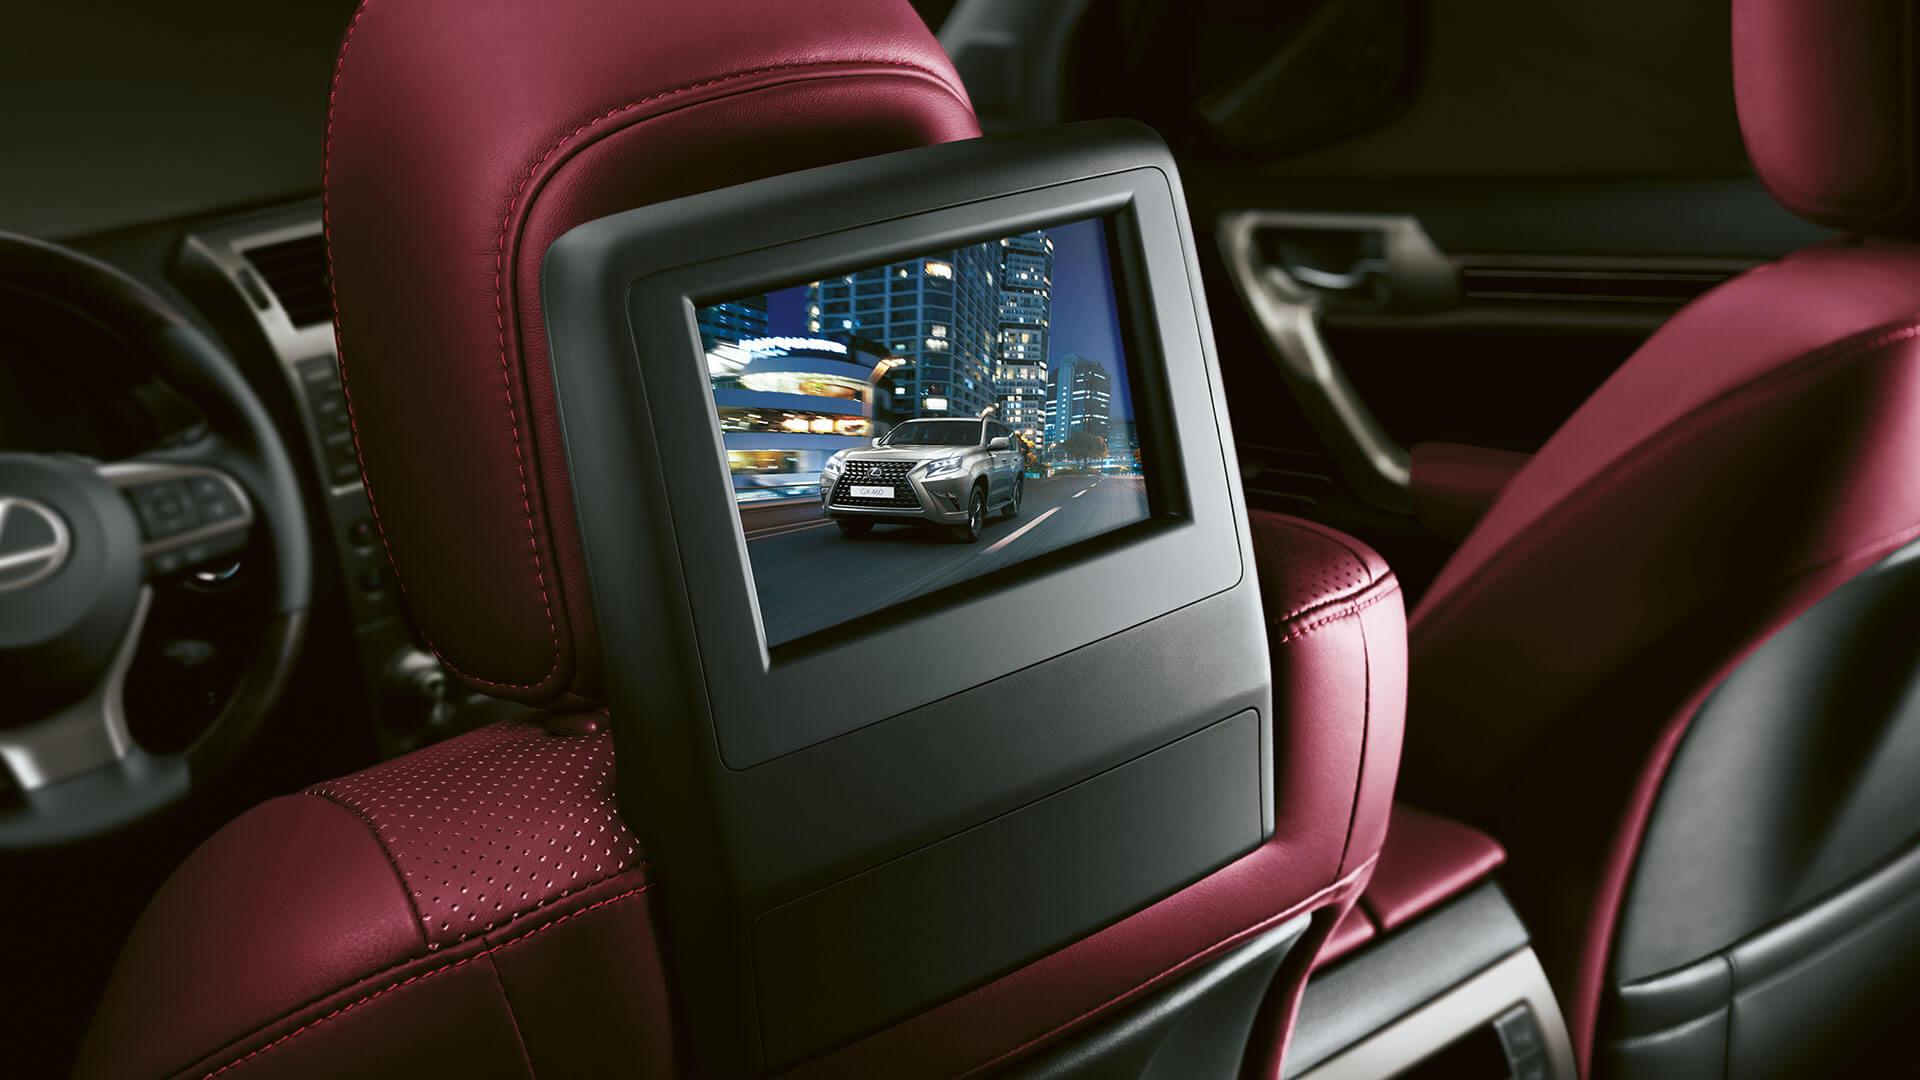 2019 lexus gx hotspot rear seat entertainment